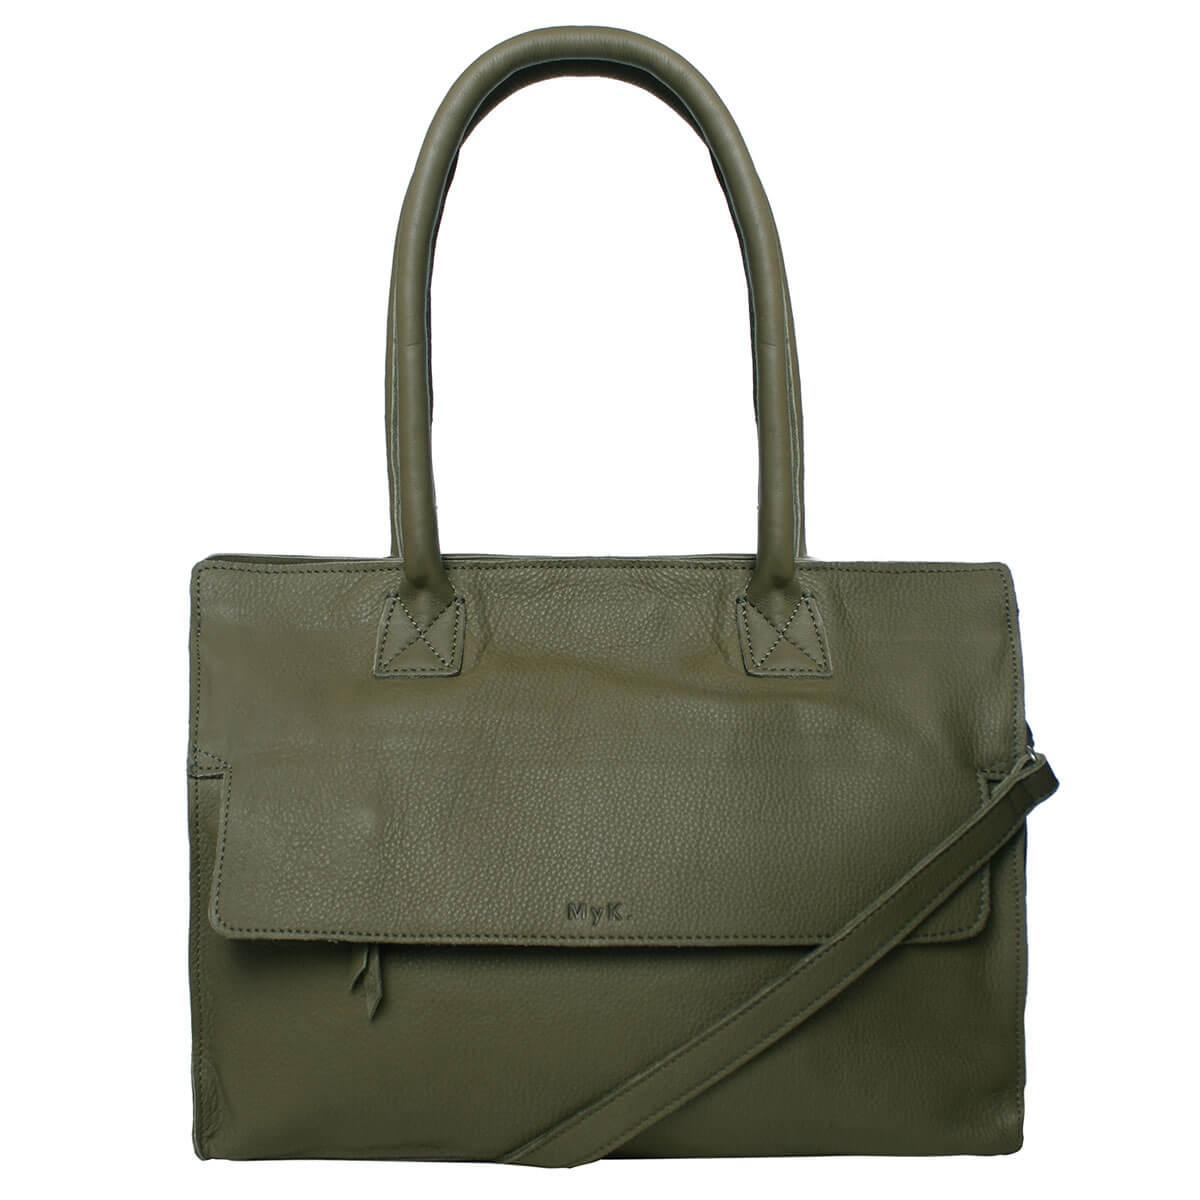 Met Credit Card Te Koop Myk Bags Bag Mustsee Olive Onder 70 Dollar Gratis Verzending Perfect 8QD3cB